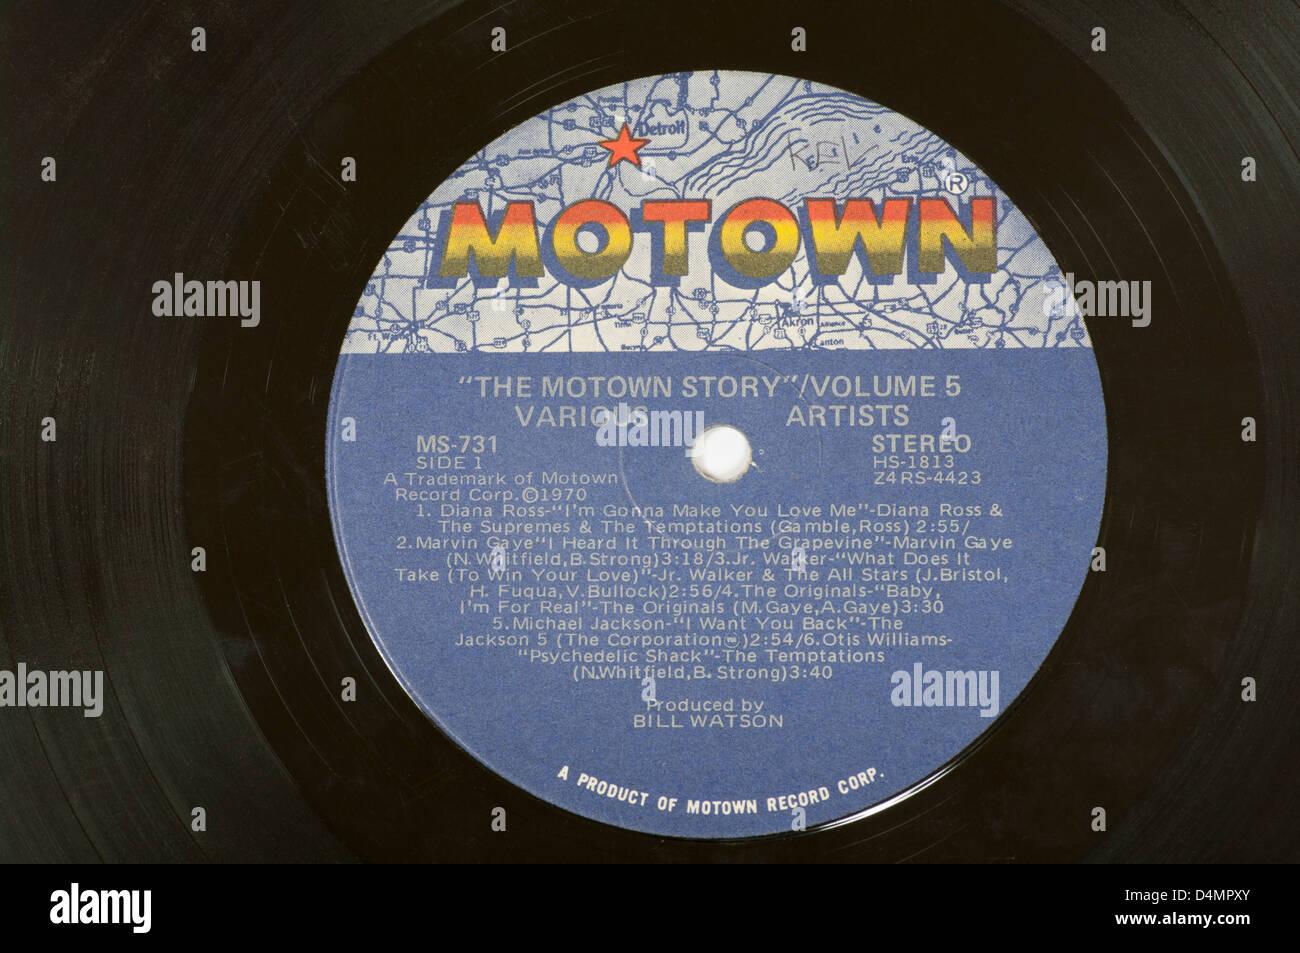 Motown Record Label On A Vinyl Lp Record Stock Photo